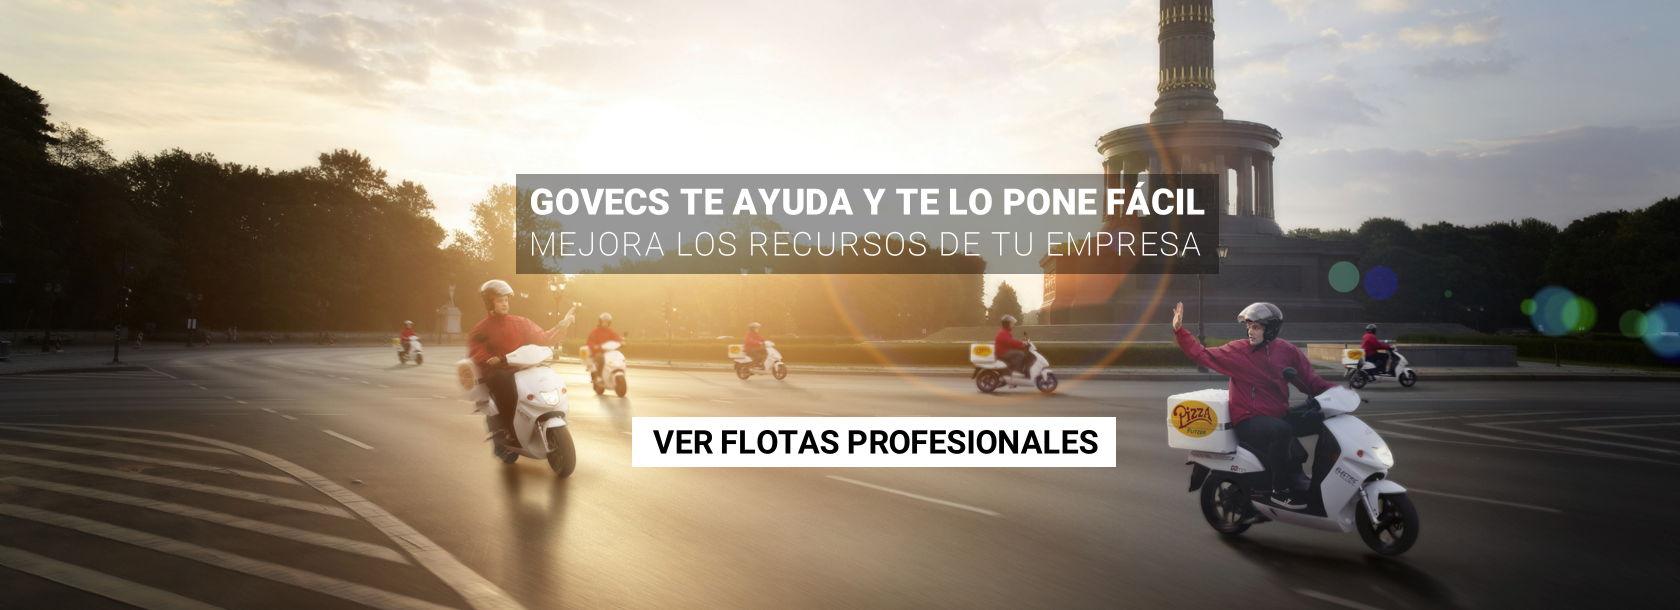 XR-MOTOS-Flotas-profesionales-GOVECS